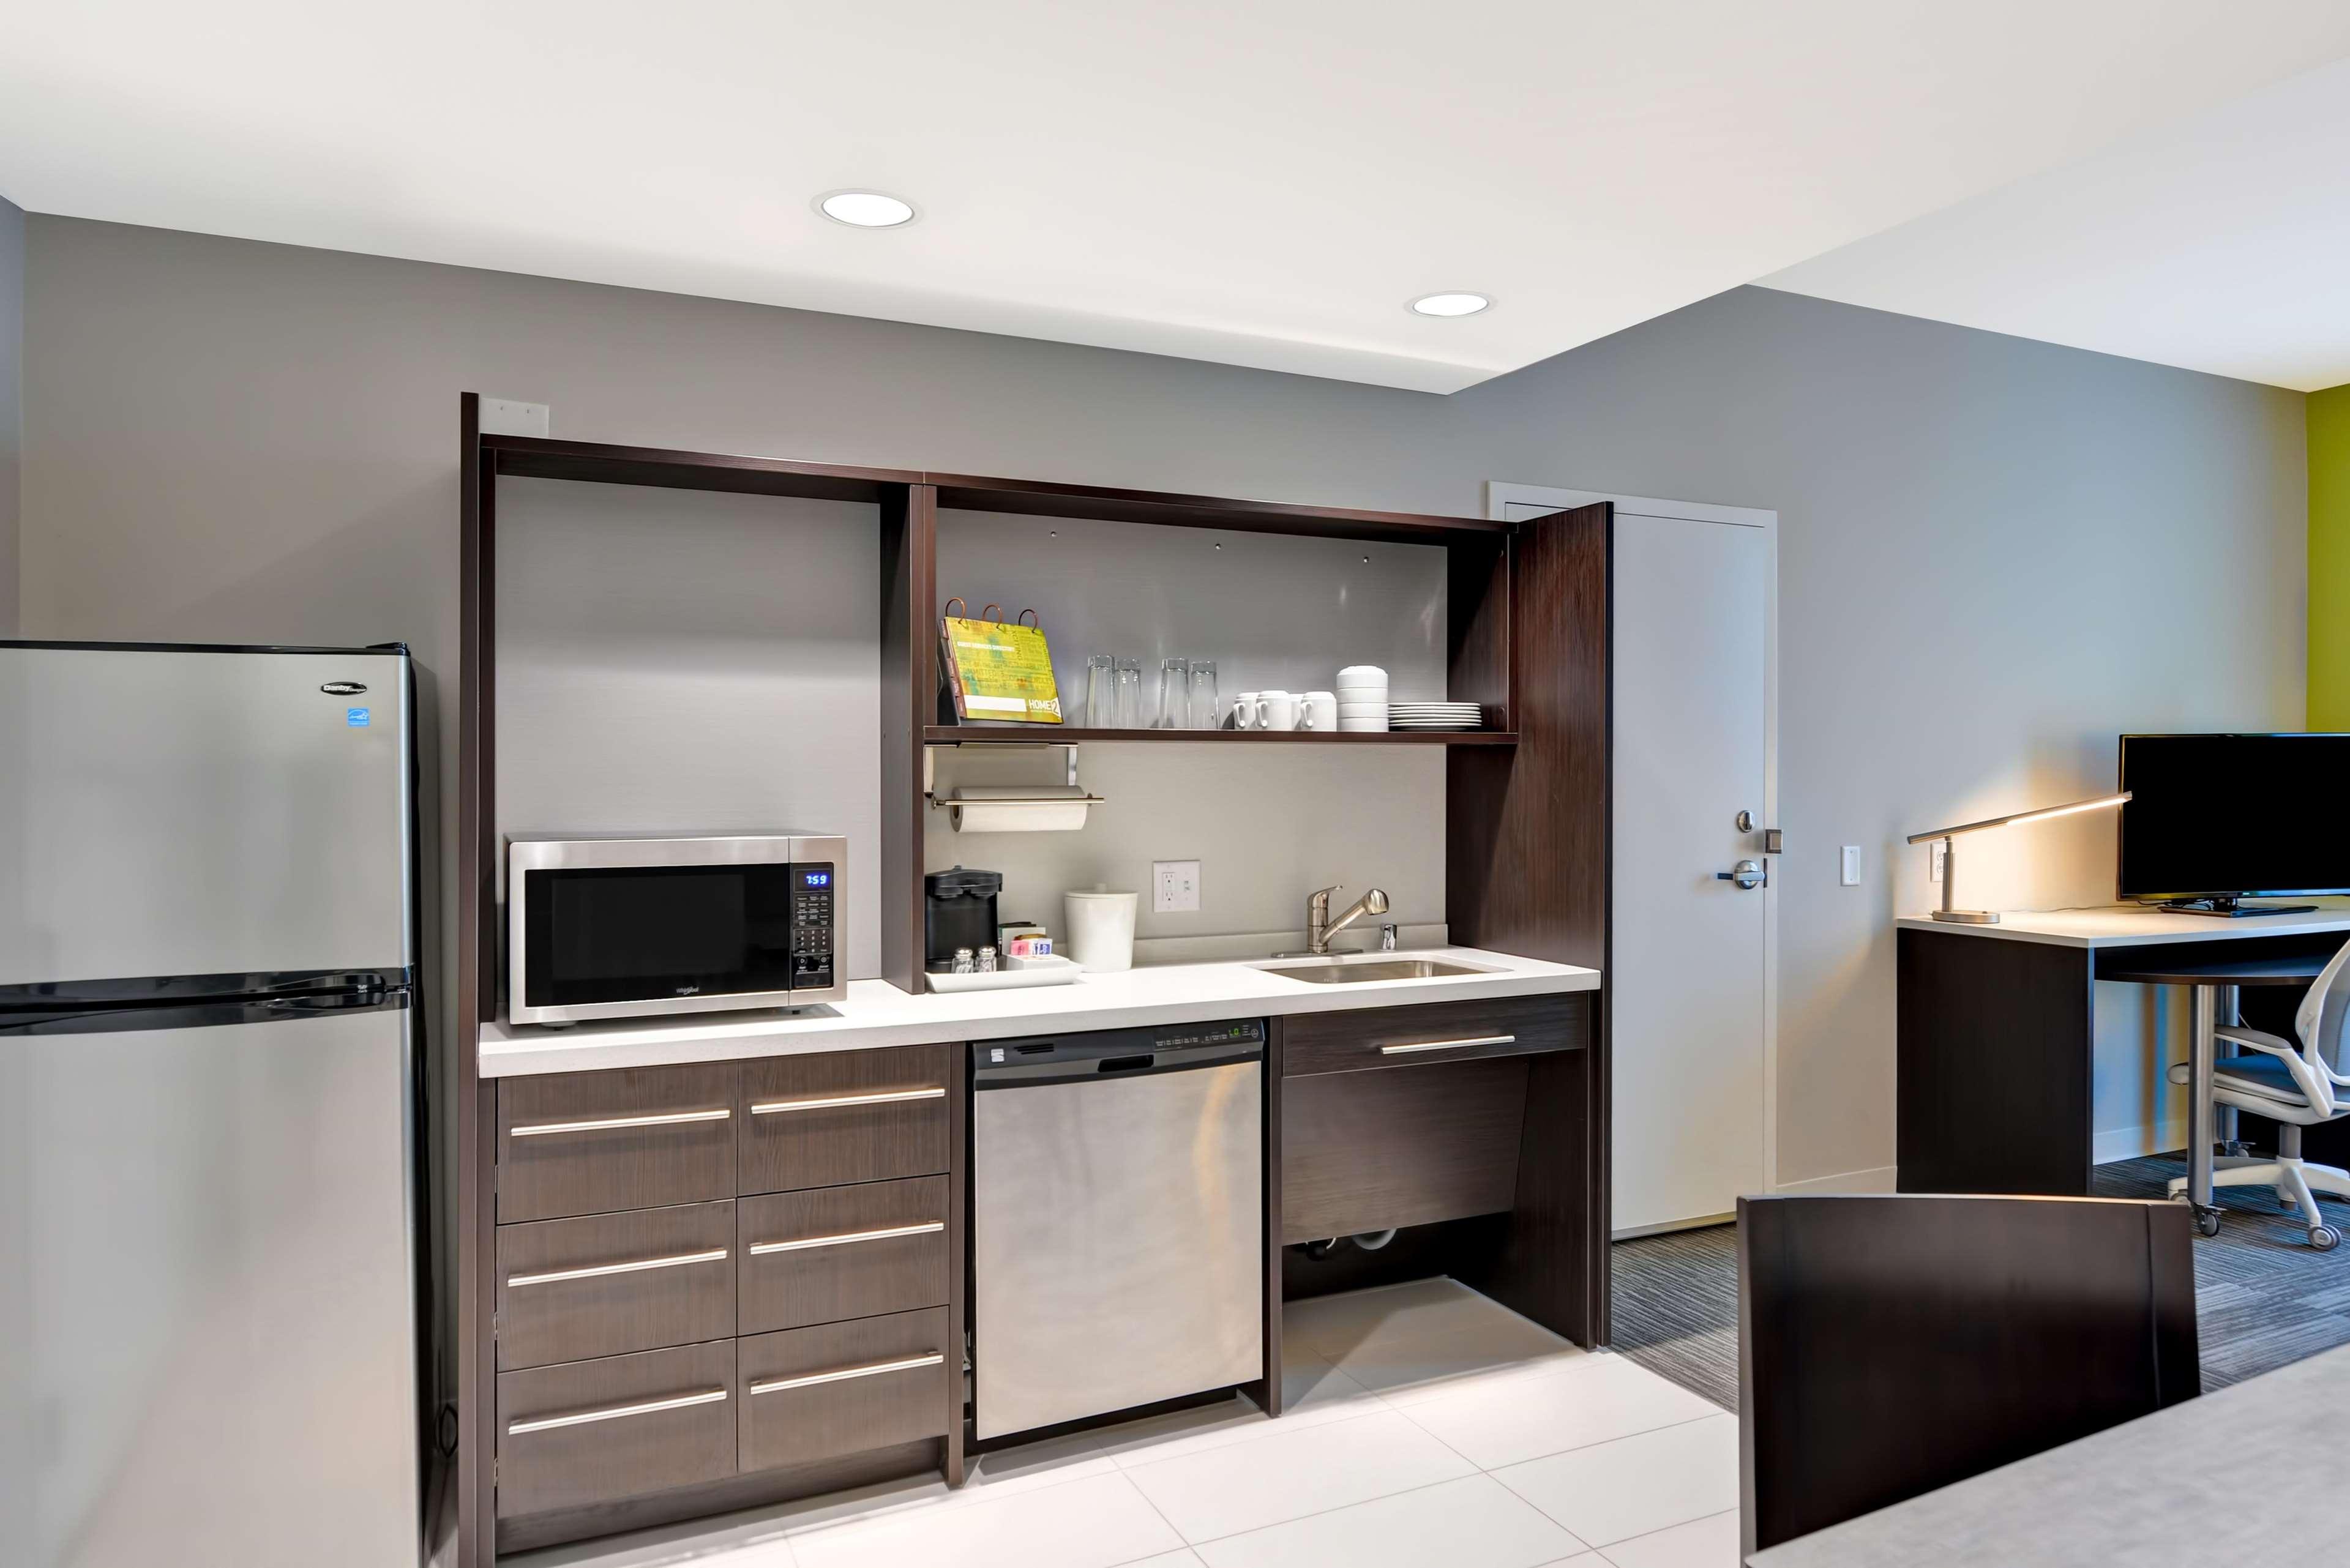 Home2 Suites by Hilton Azusa image 2